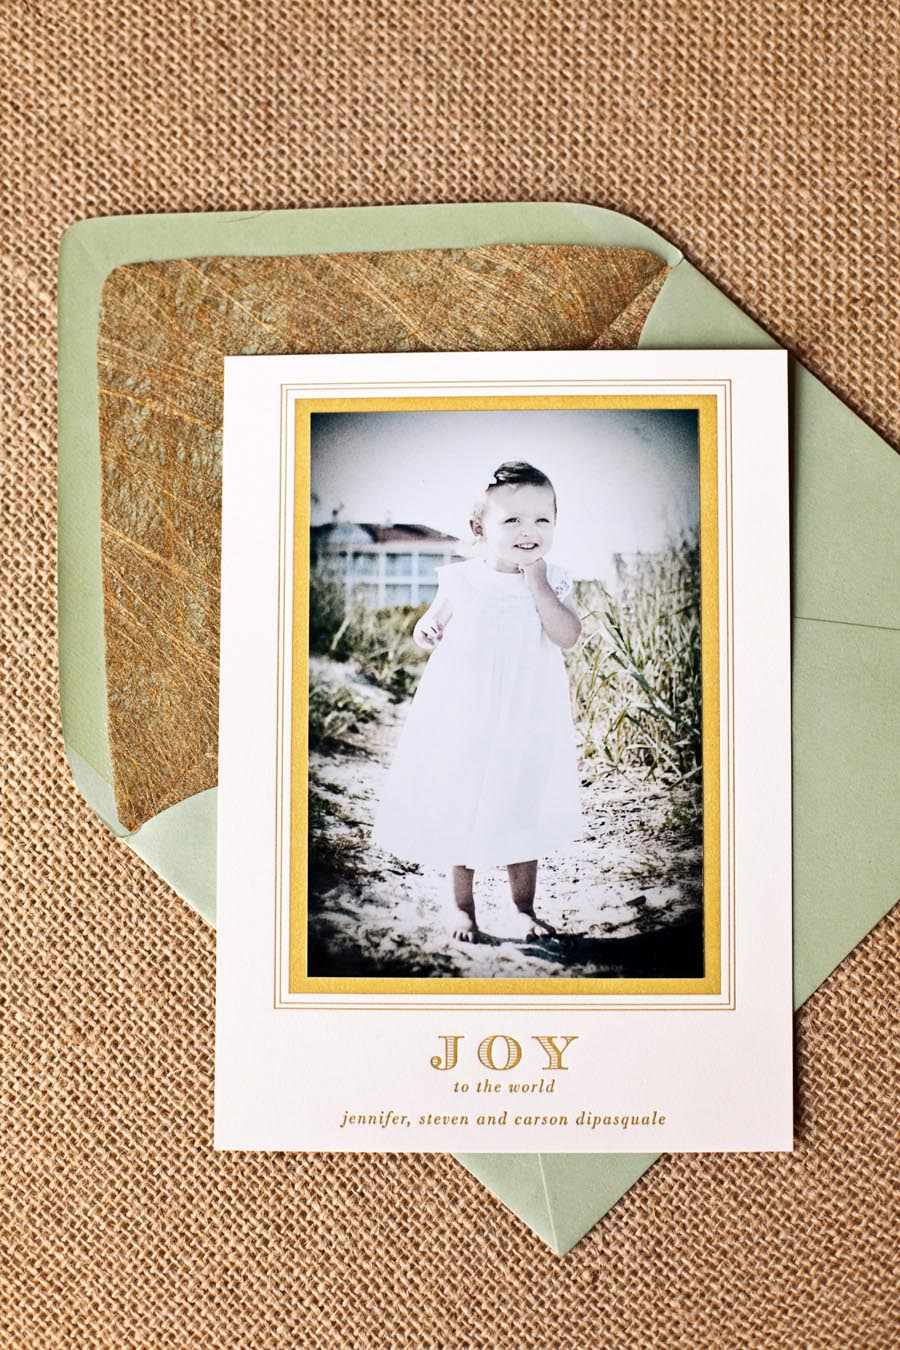 joy-to-the-world-2 (1)